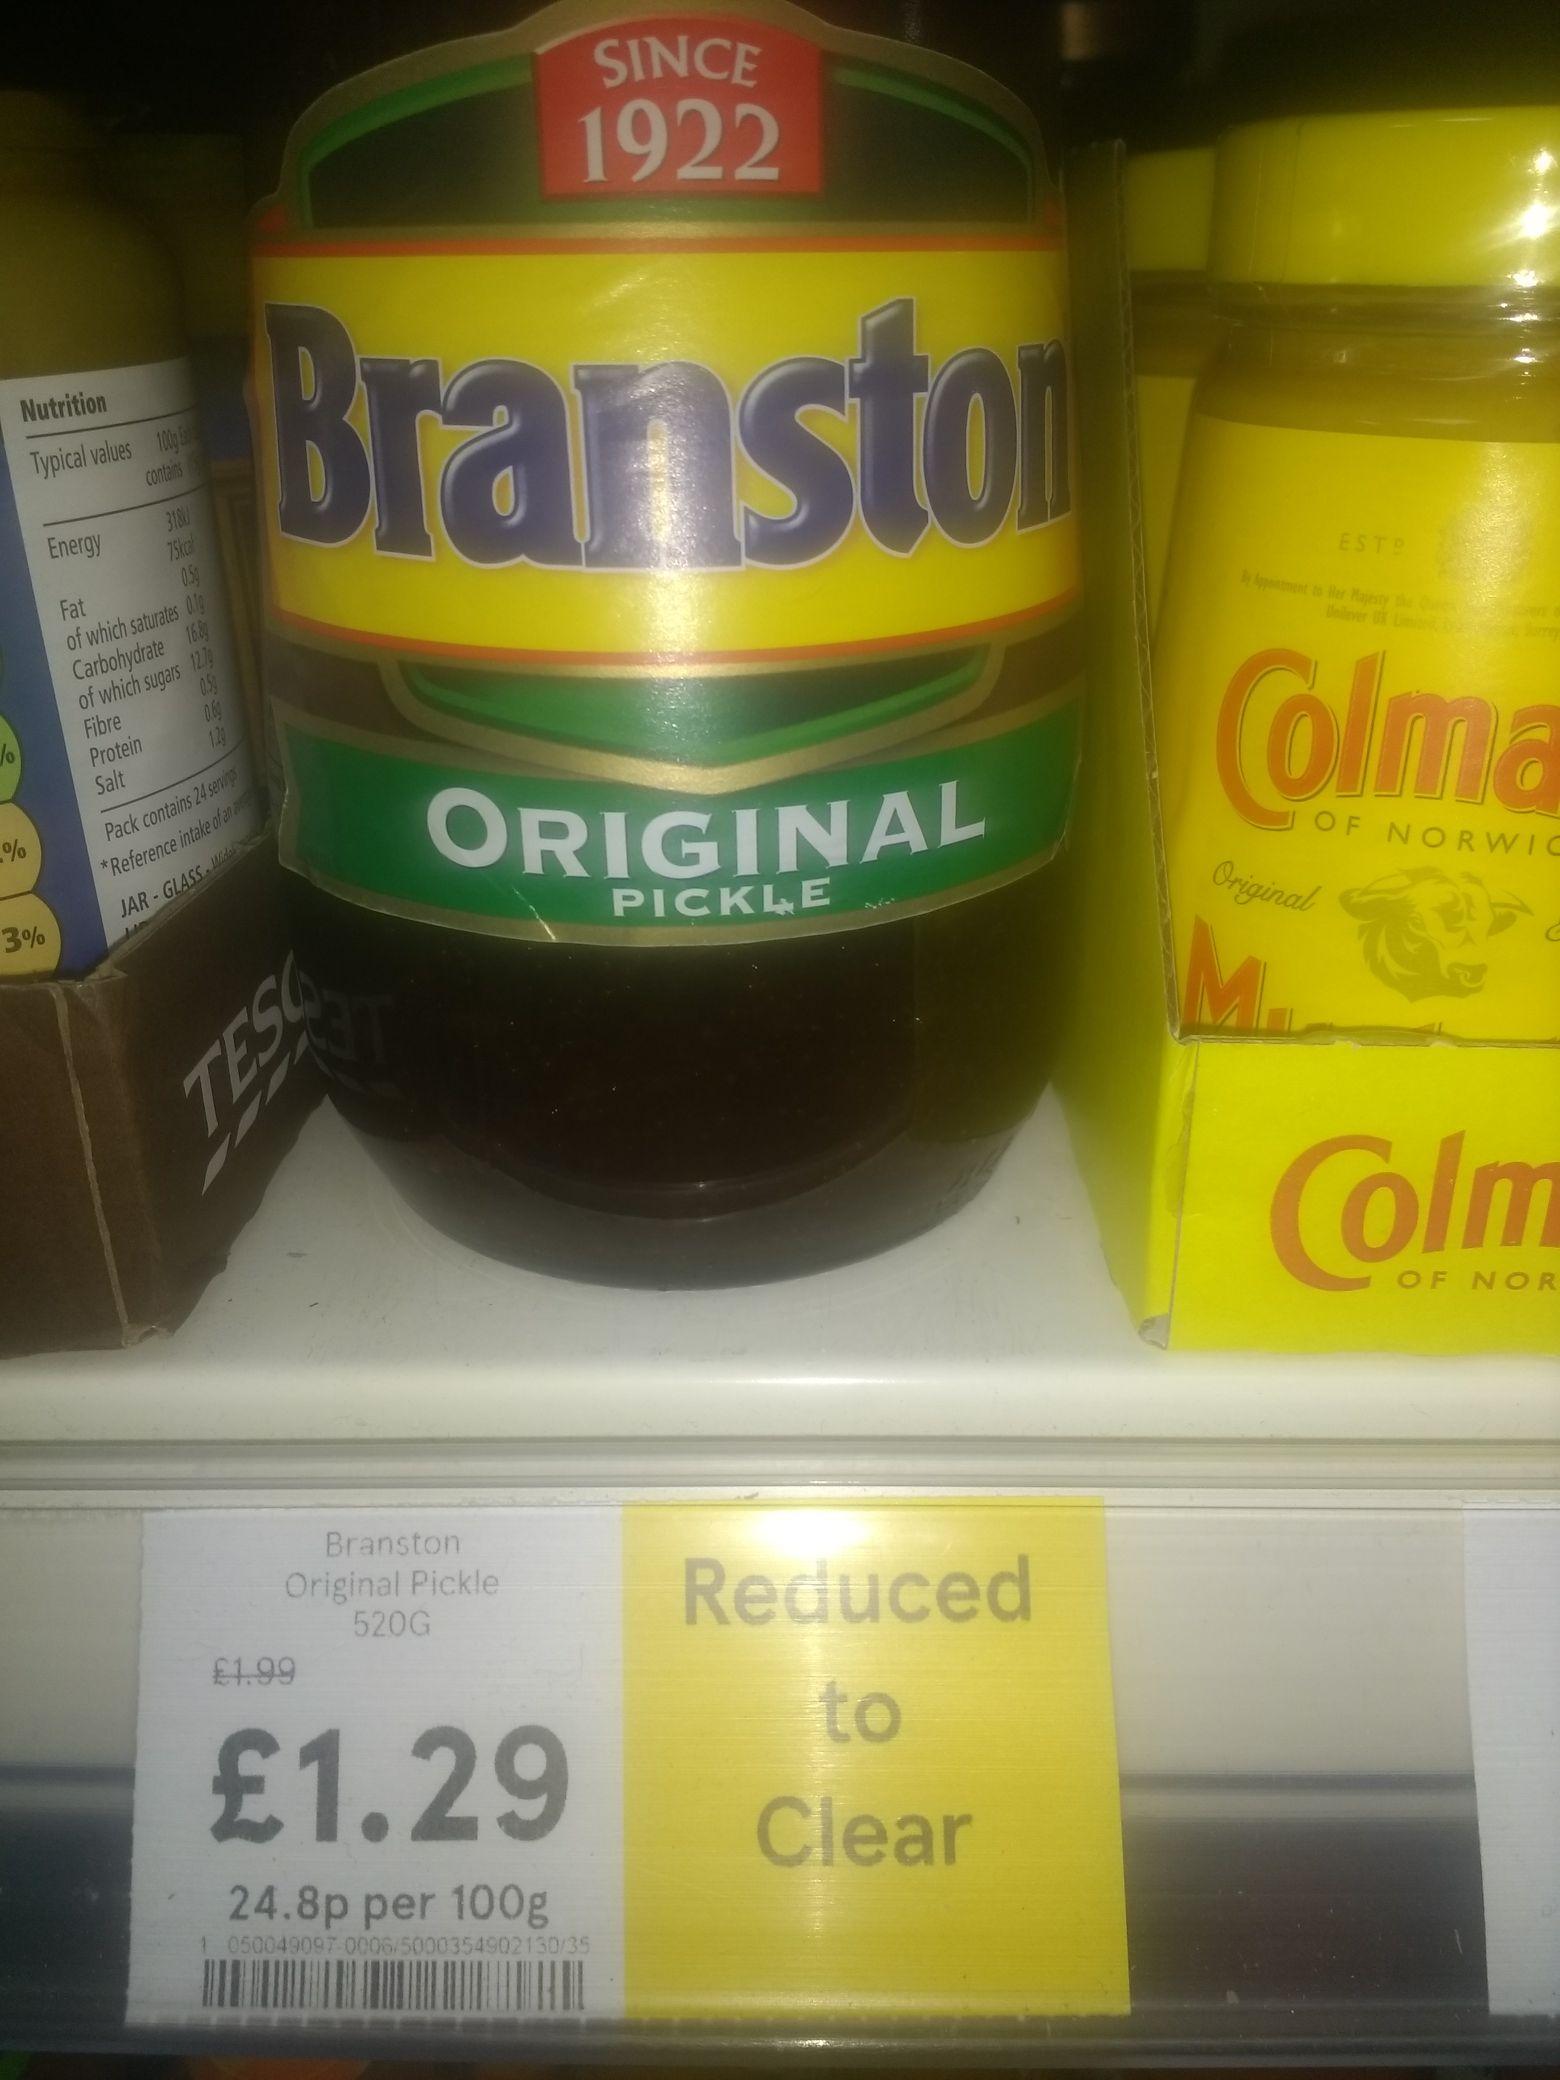 Tesco (Express) Branston Pickle Oriignal 520g RTC £1.29 instore